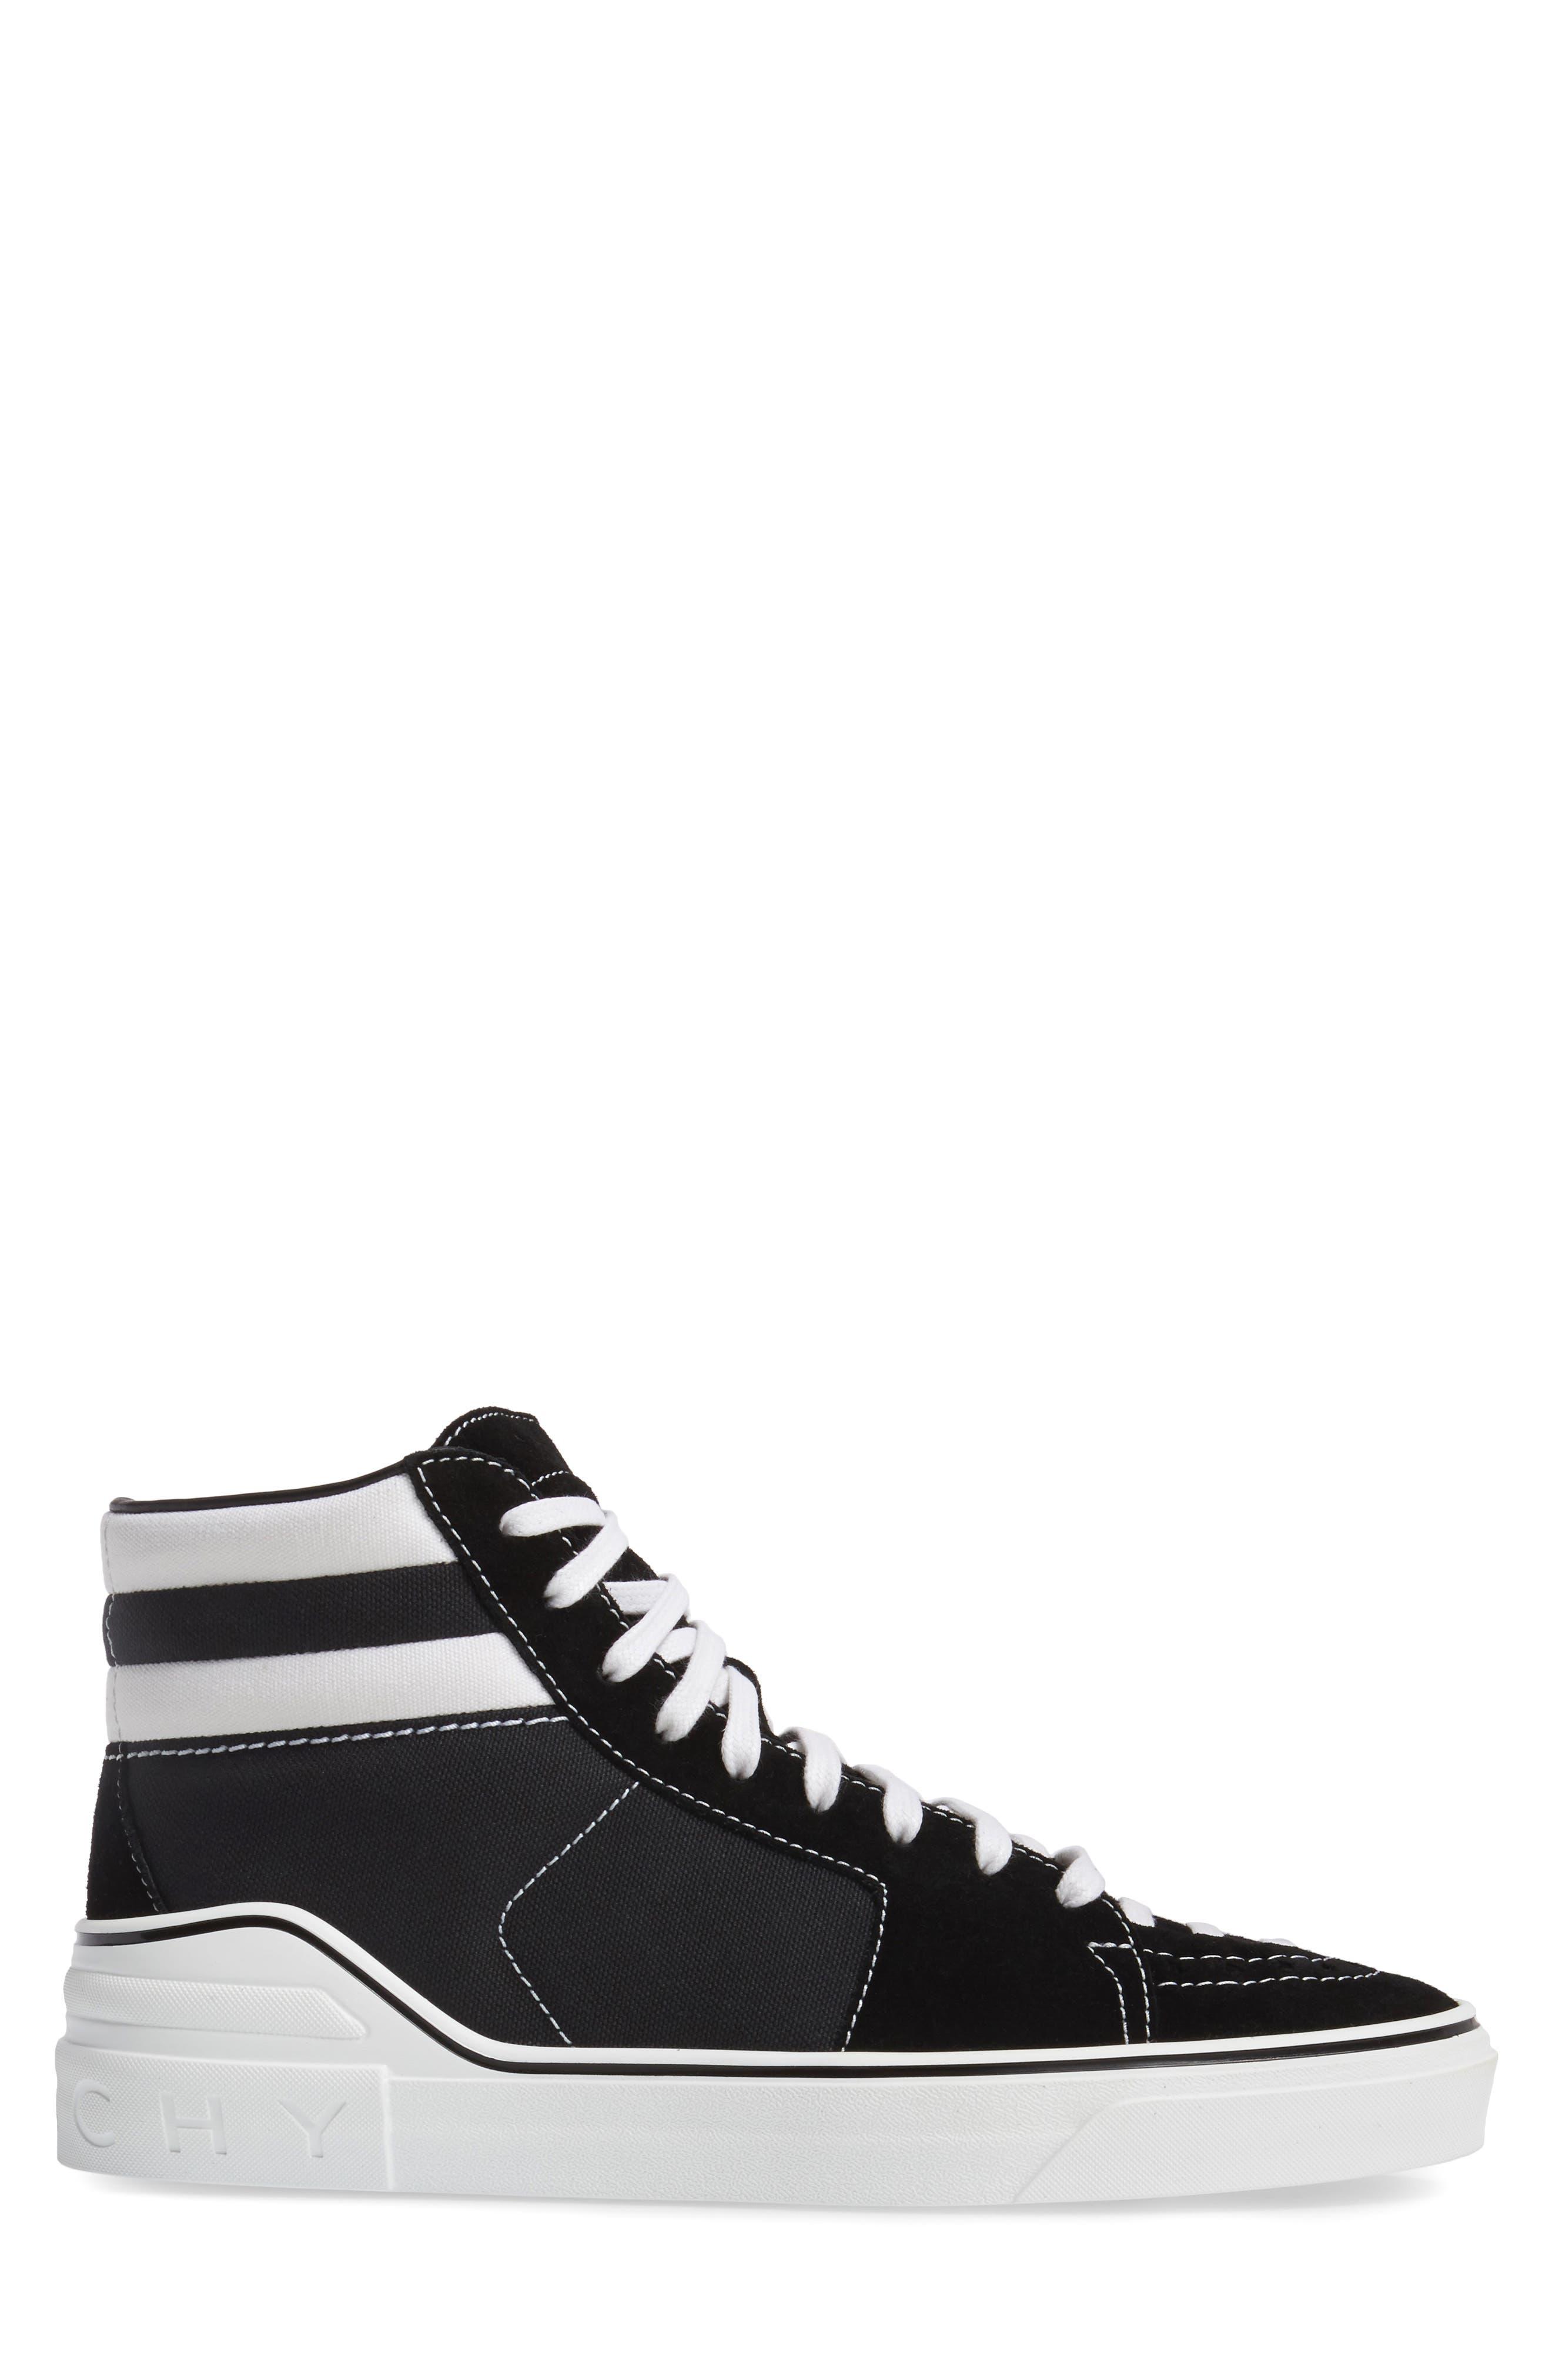 High Top Sneaker,                             Alternate thumbnail 3, color,                             004